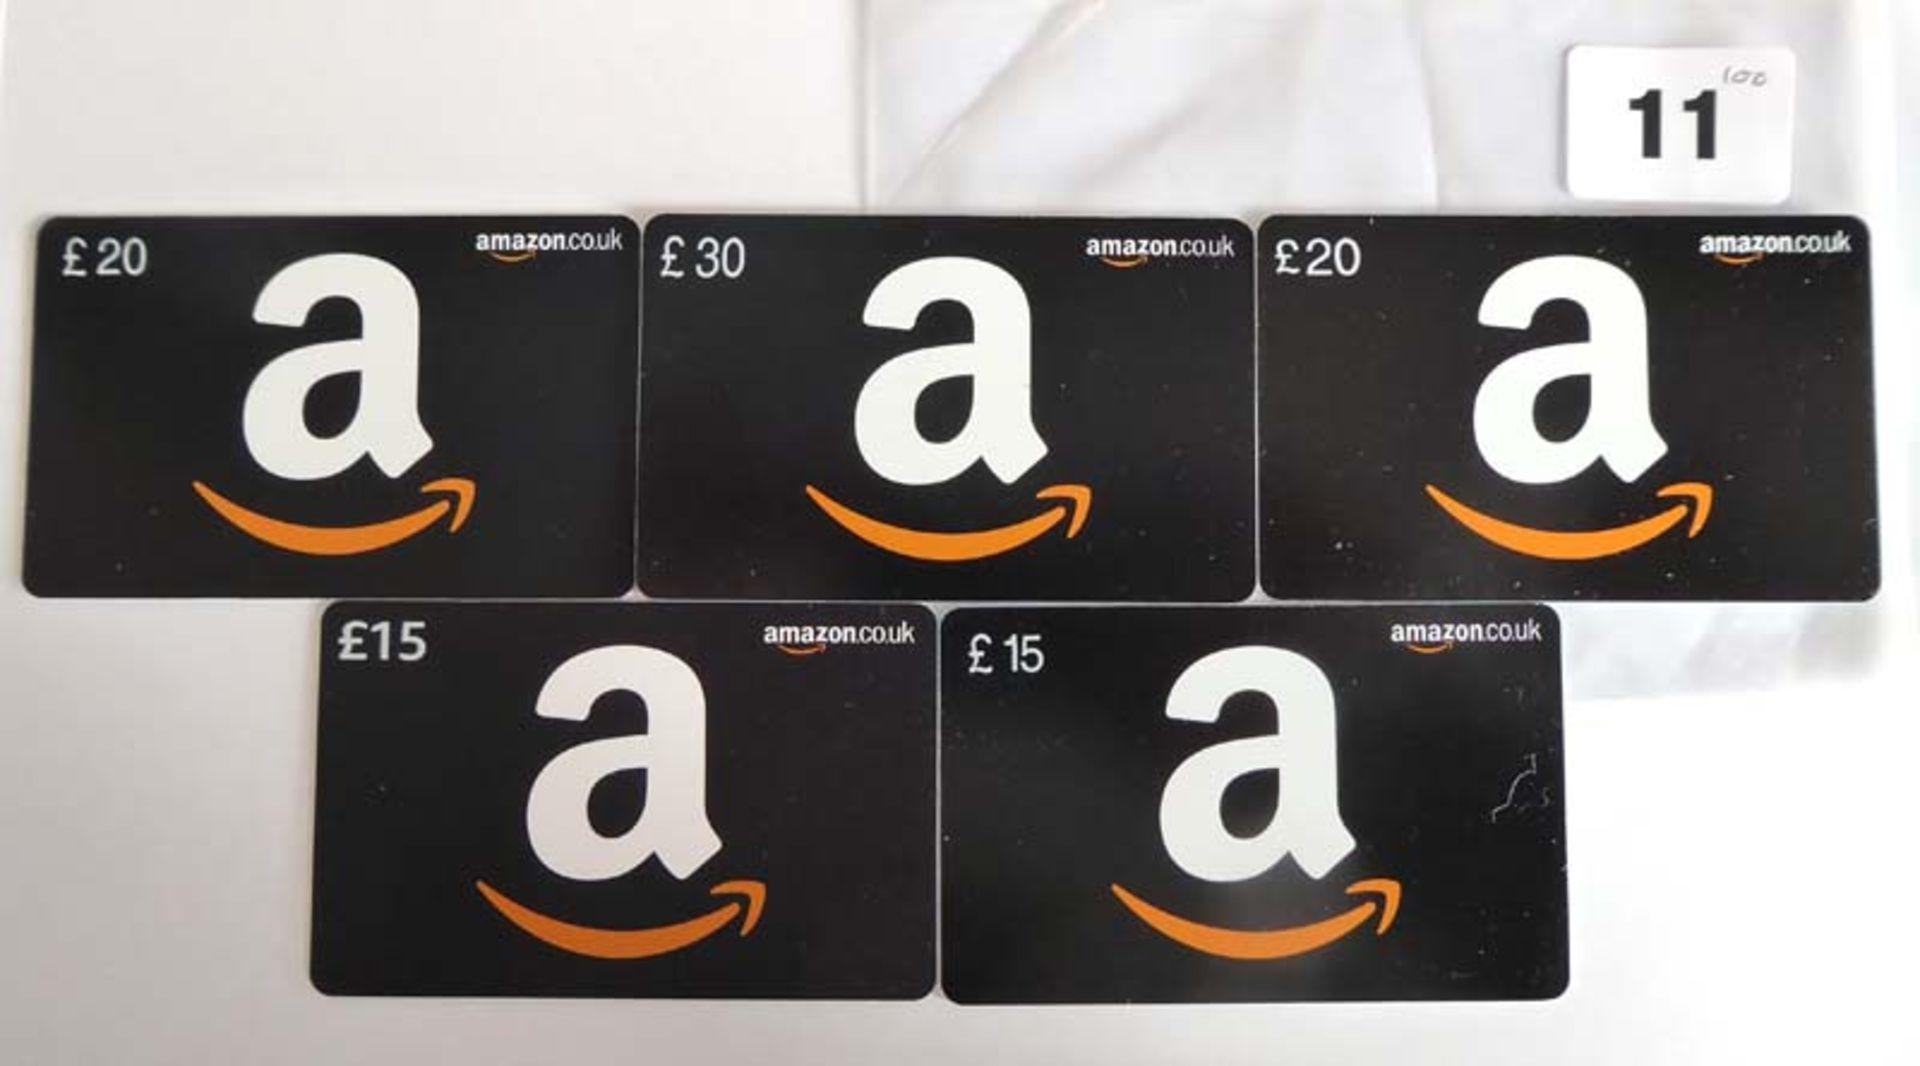 Lot 11 - Amazon (x5) - Total face value £100